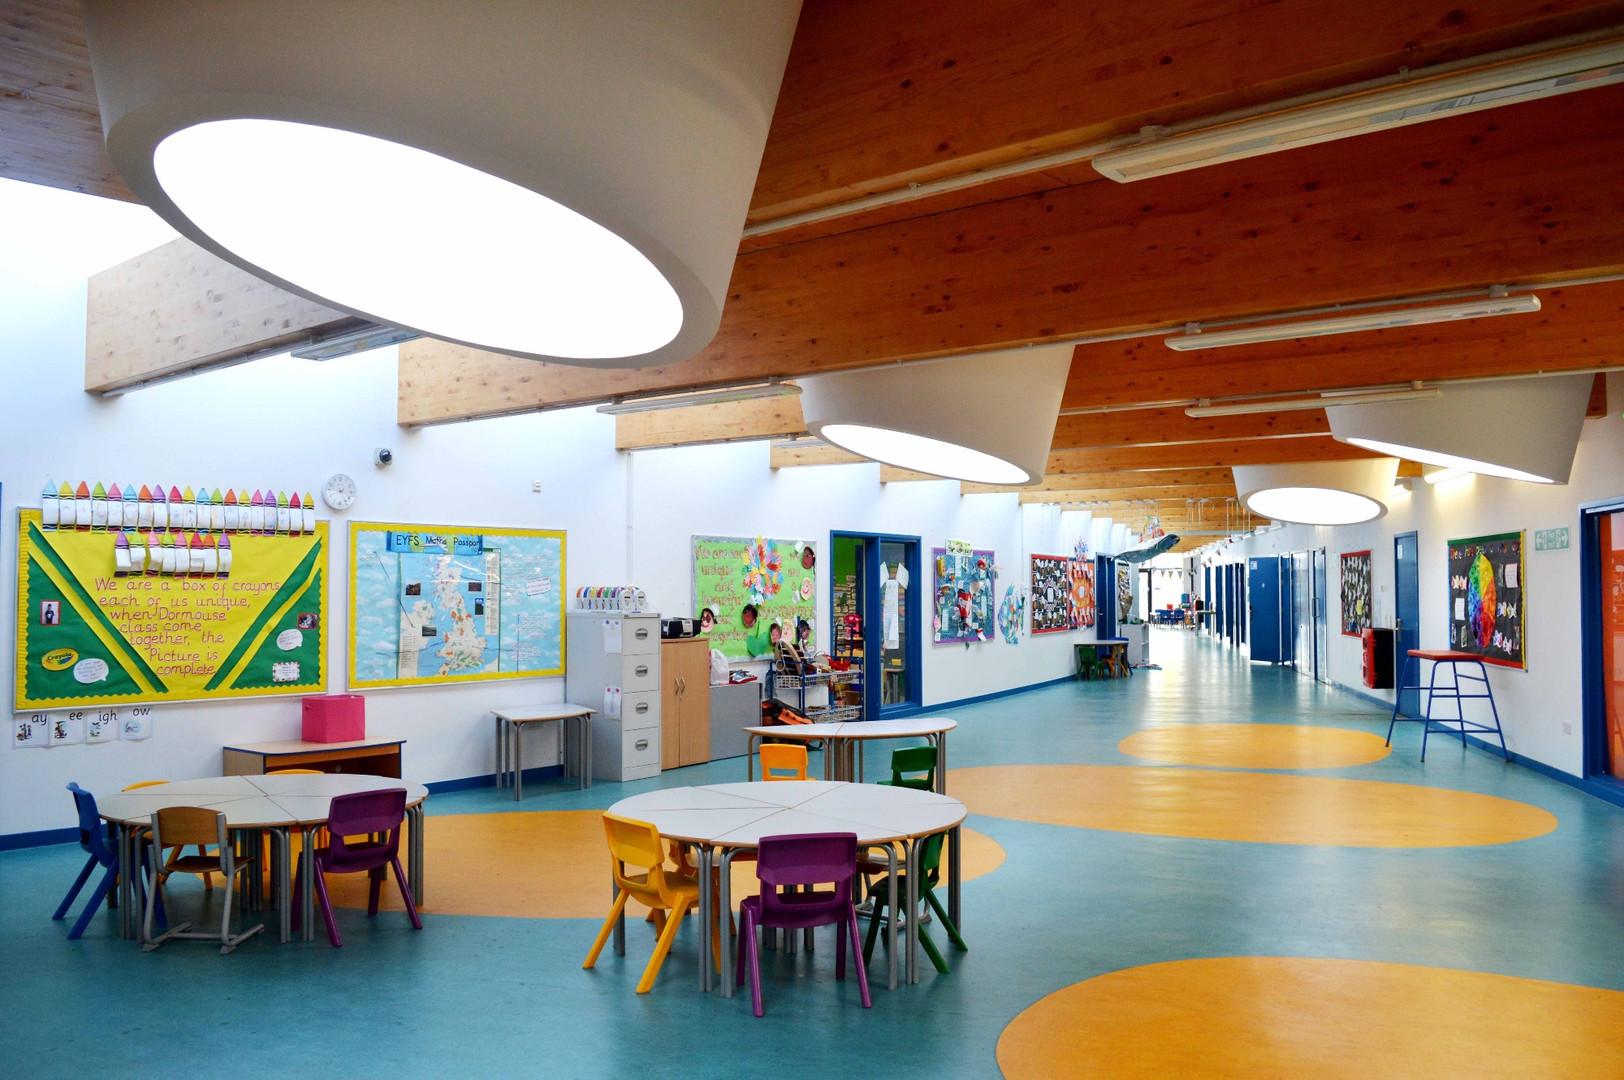 Alec Reed Academy